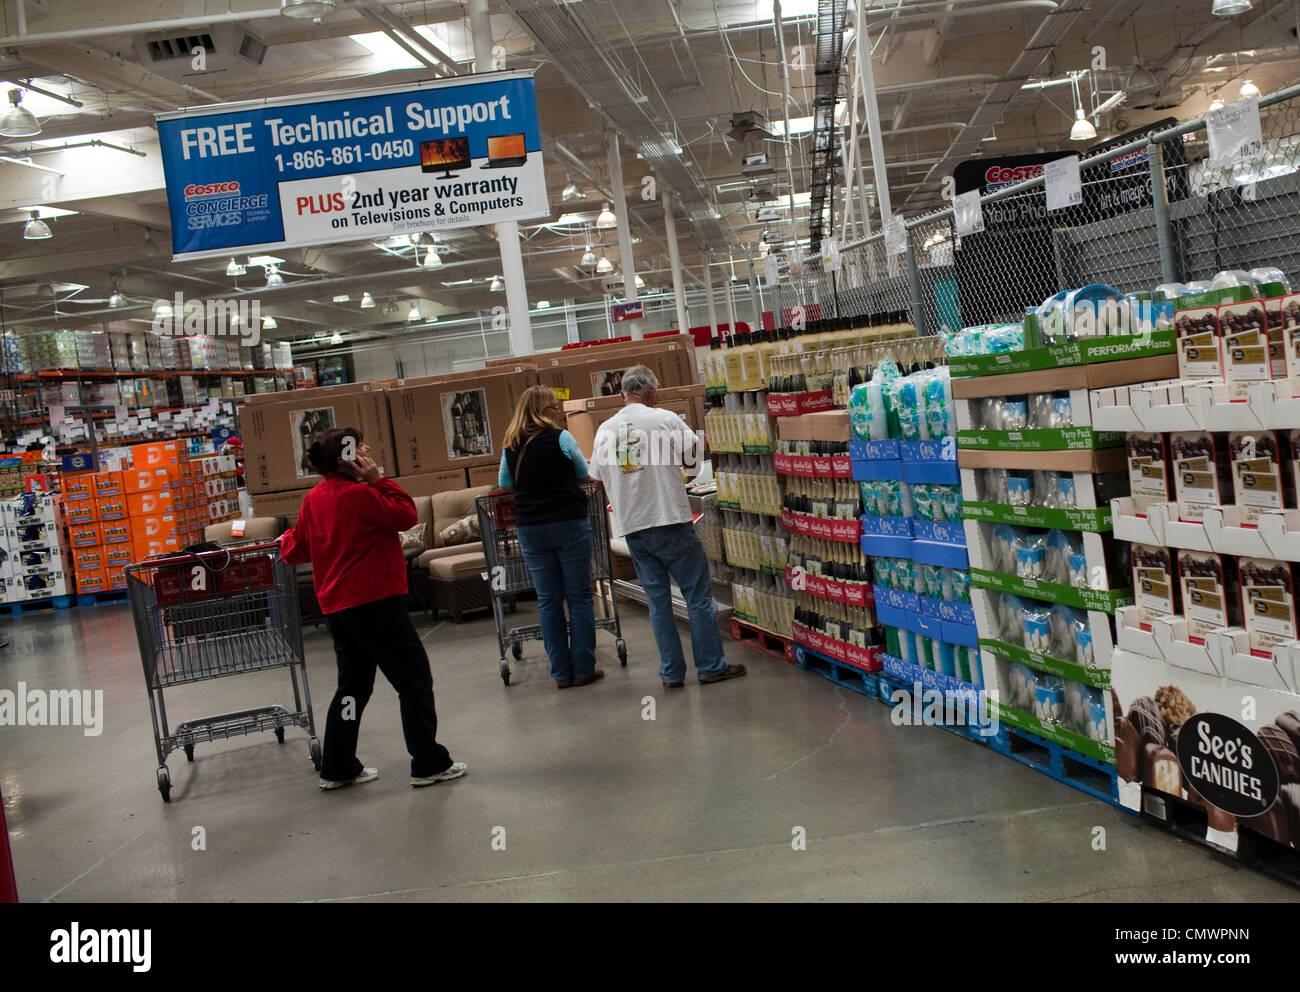 Bulk Discount Imágenes De Stock & Bulk Discount Fotos De Stock - Alamy